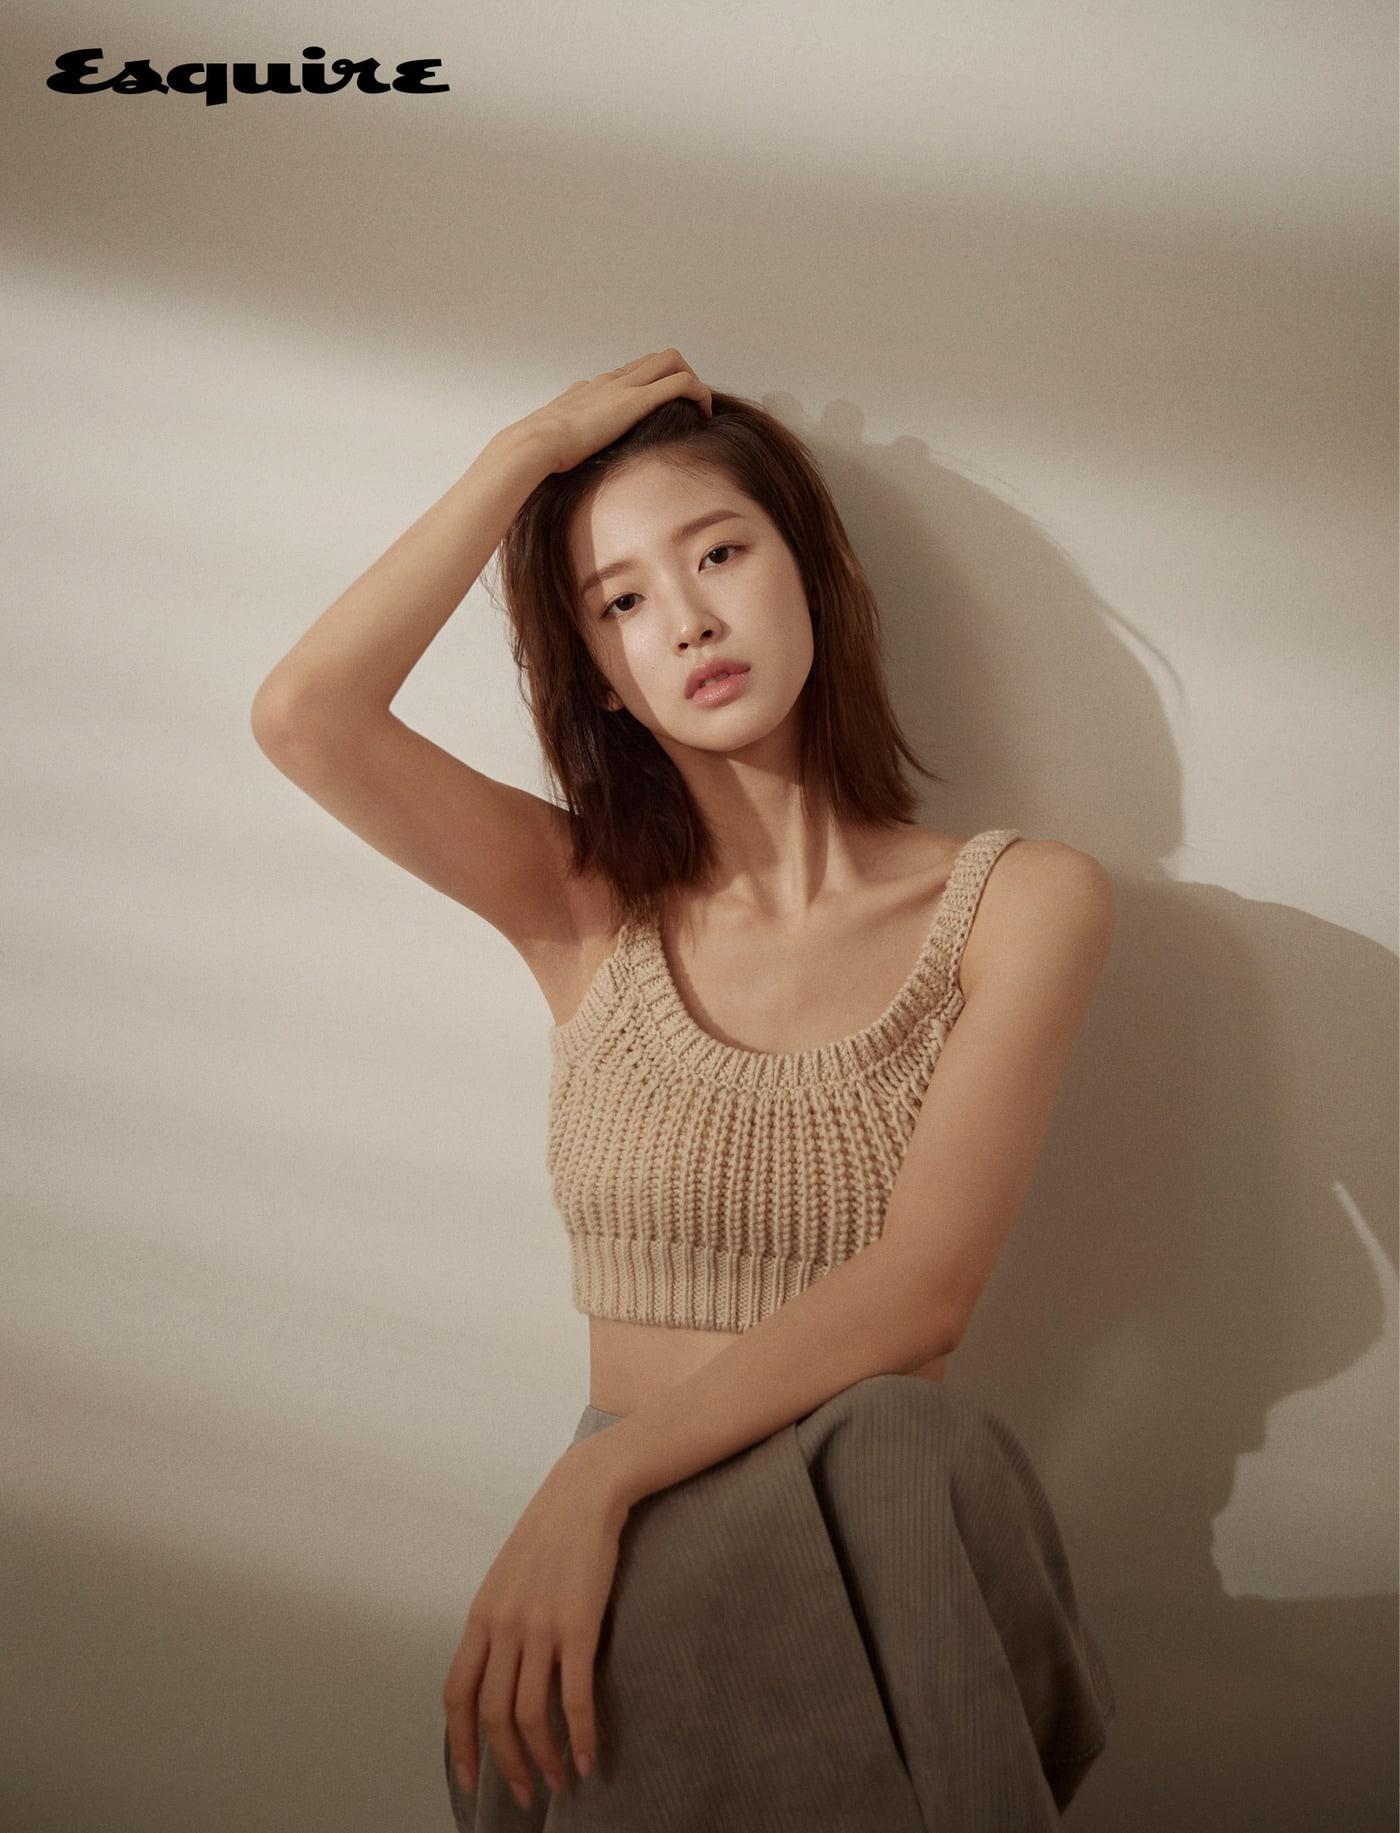 Oh My Girl崔乂园ARin公开新写真 探讨她的真实性格以及《少女的世界》影响